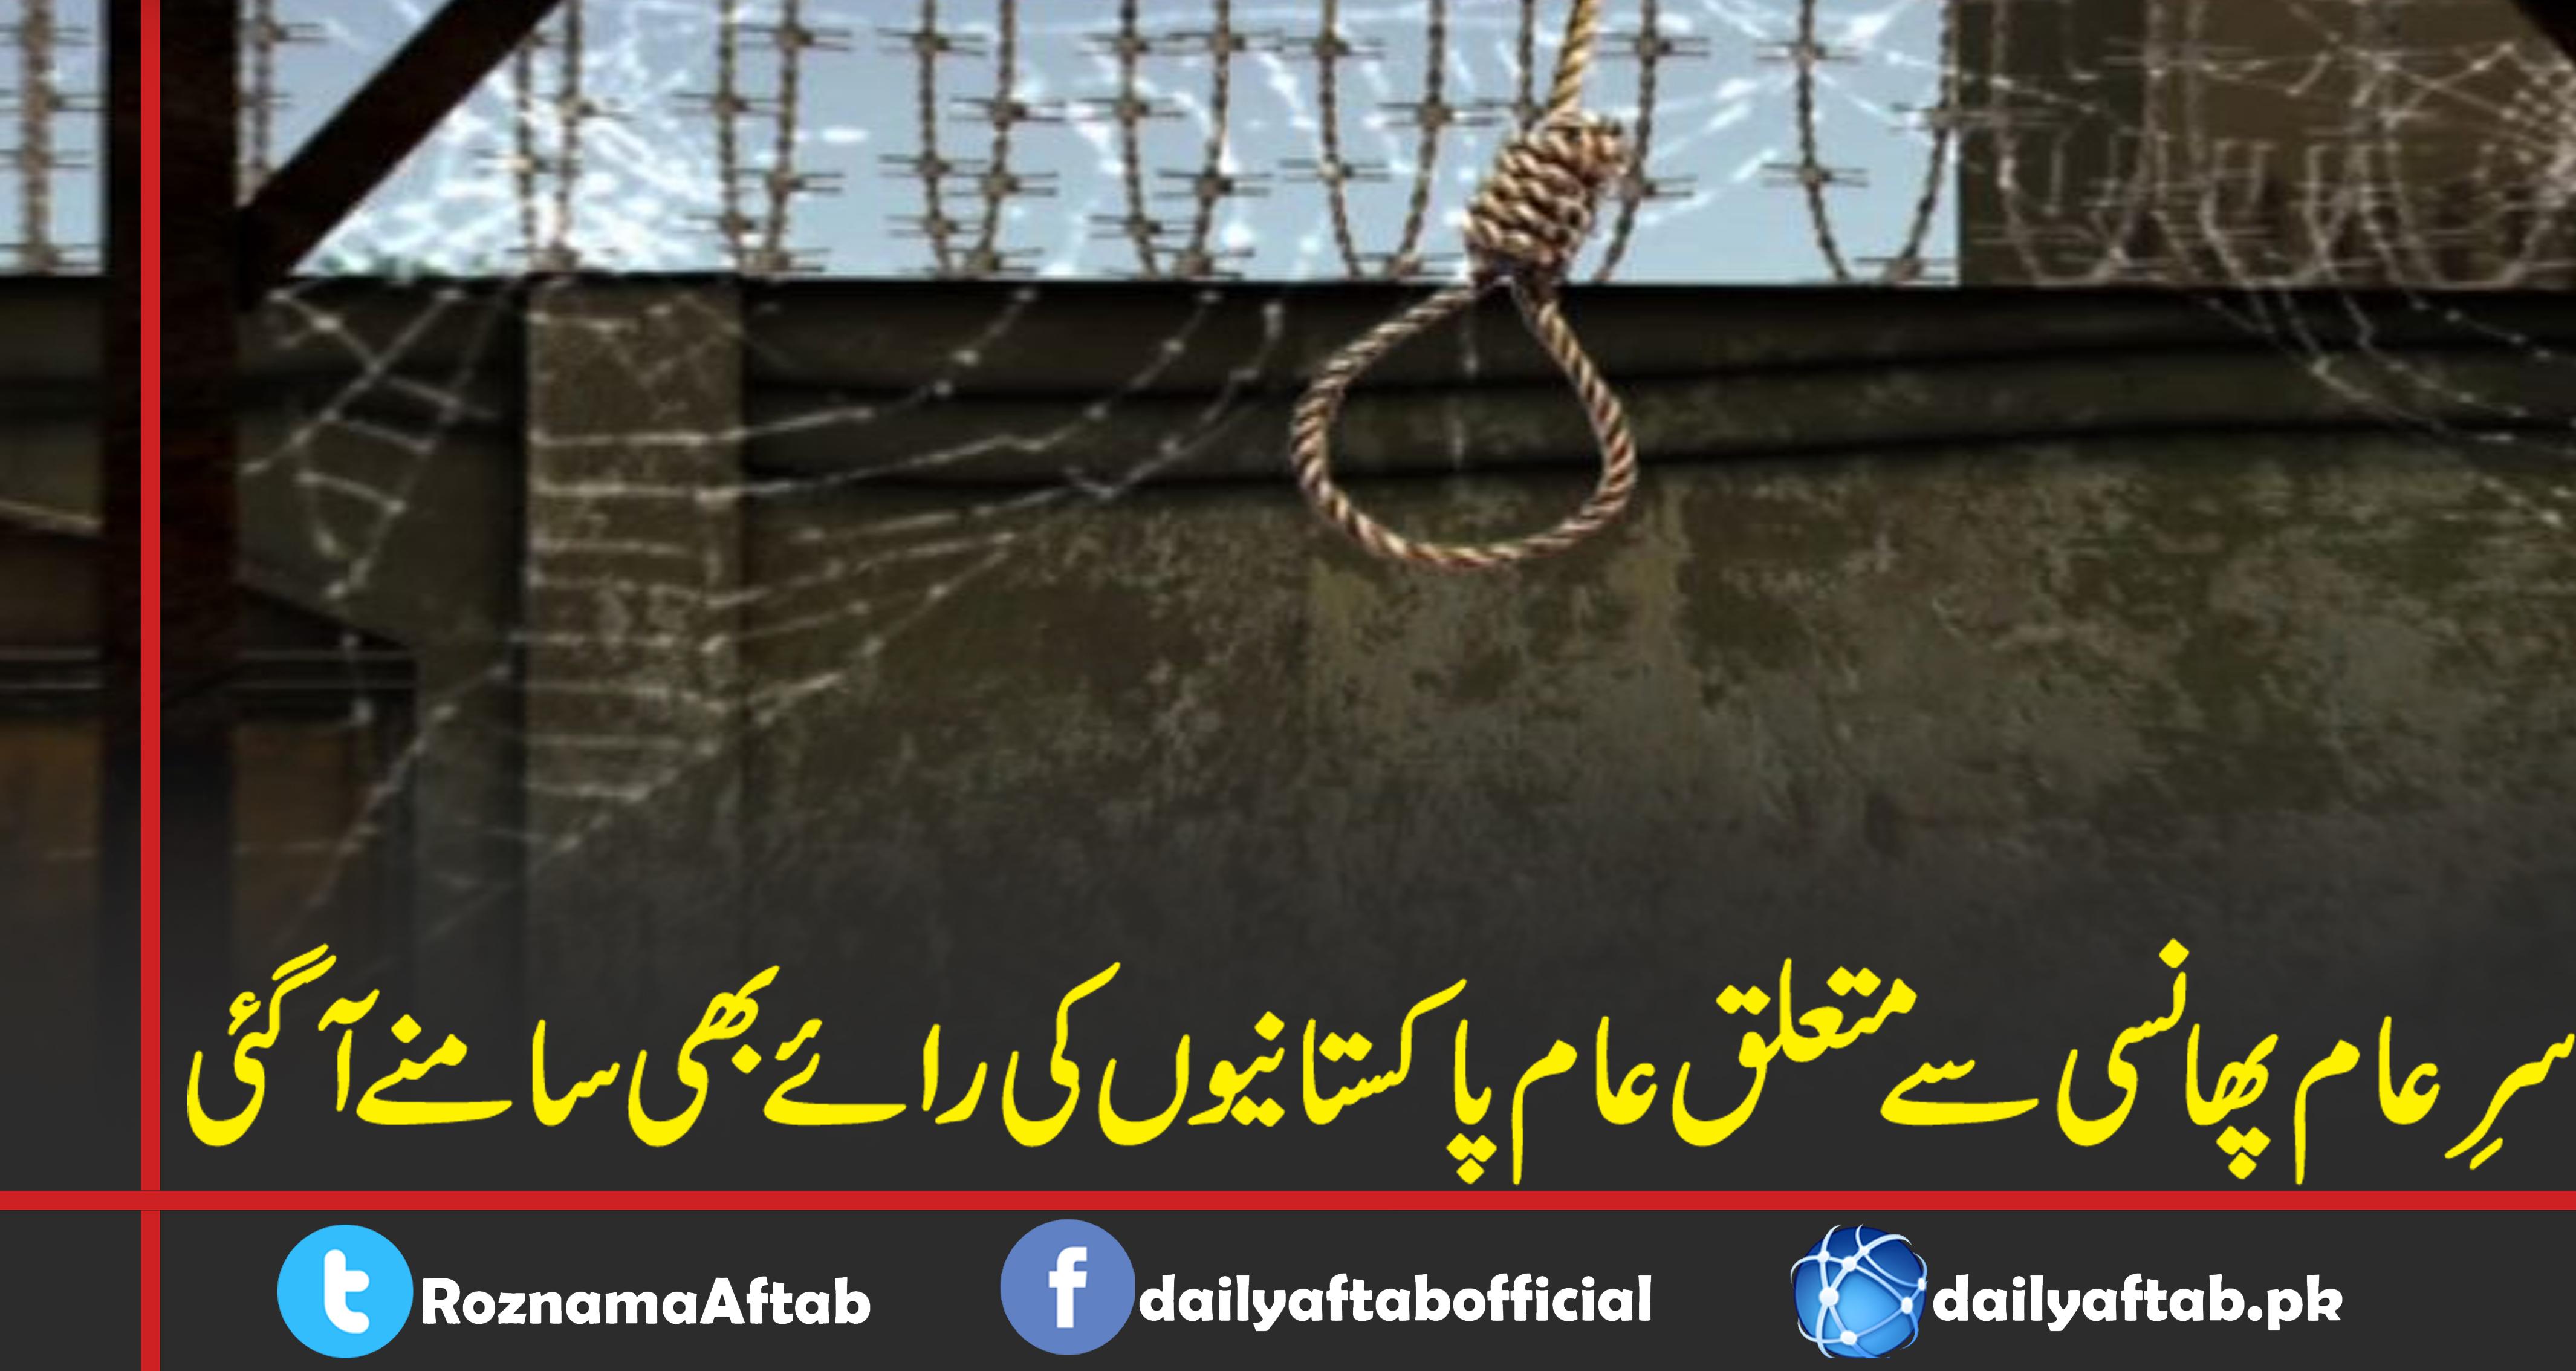 Public Hanging, Pakistanis, Survey, Vote, Crime, Child Abuse